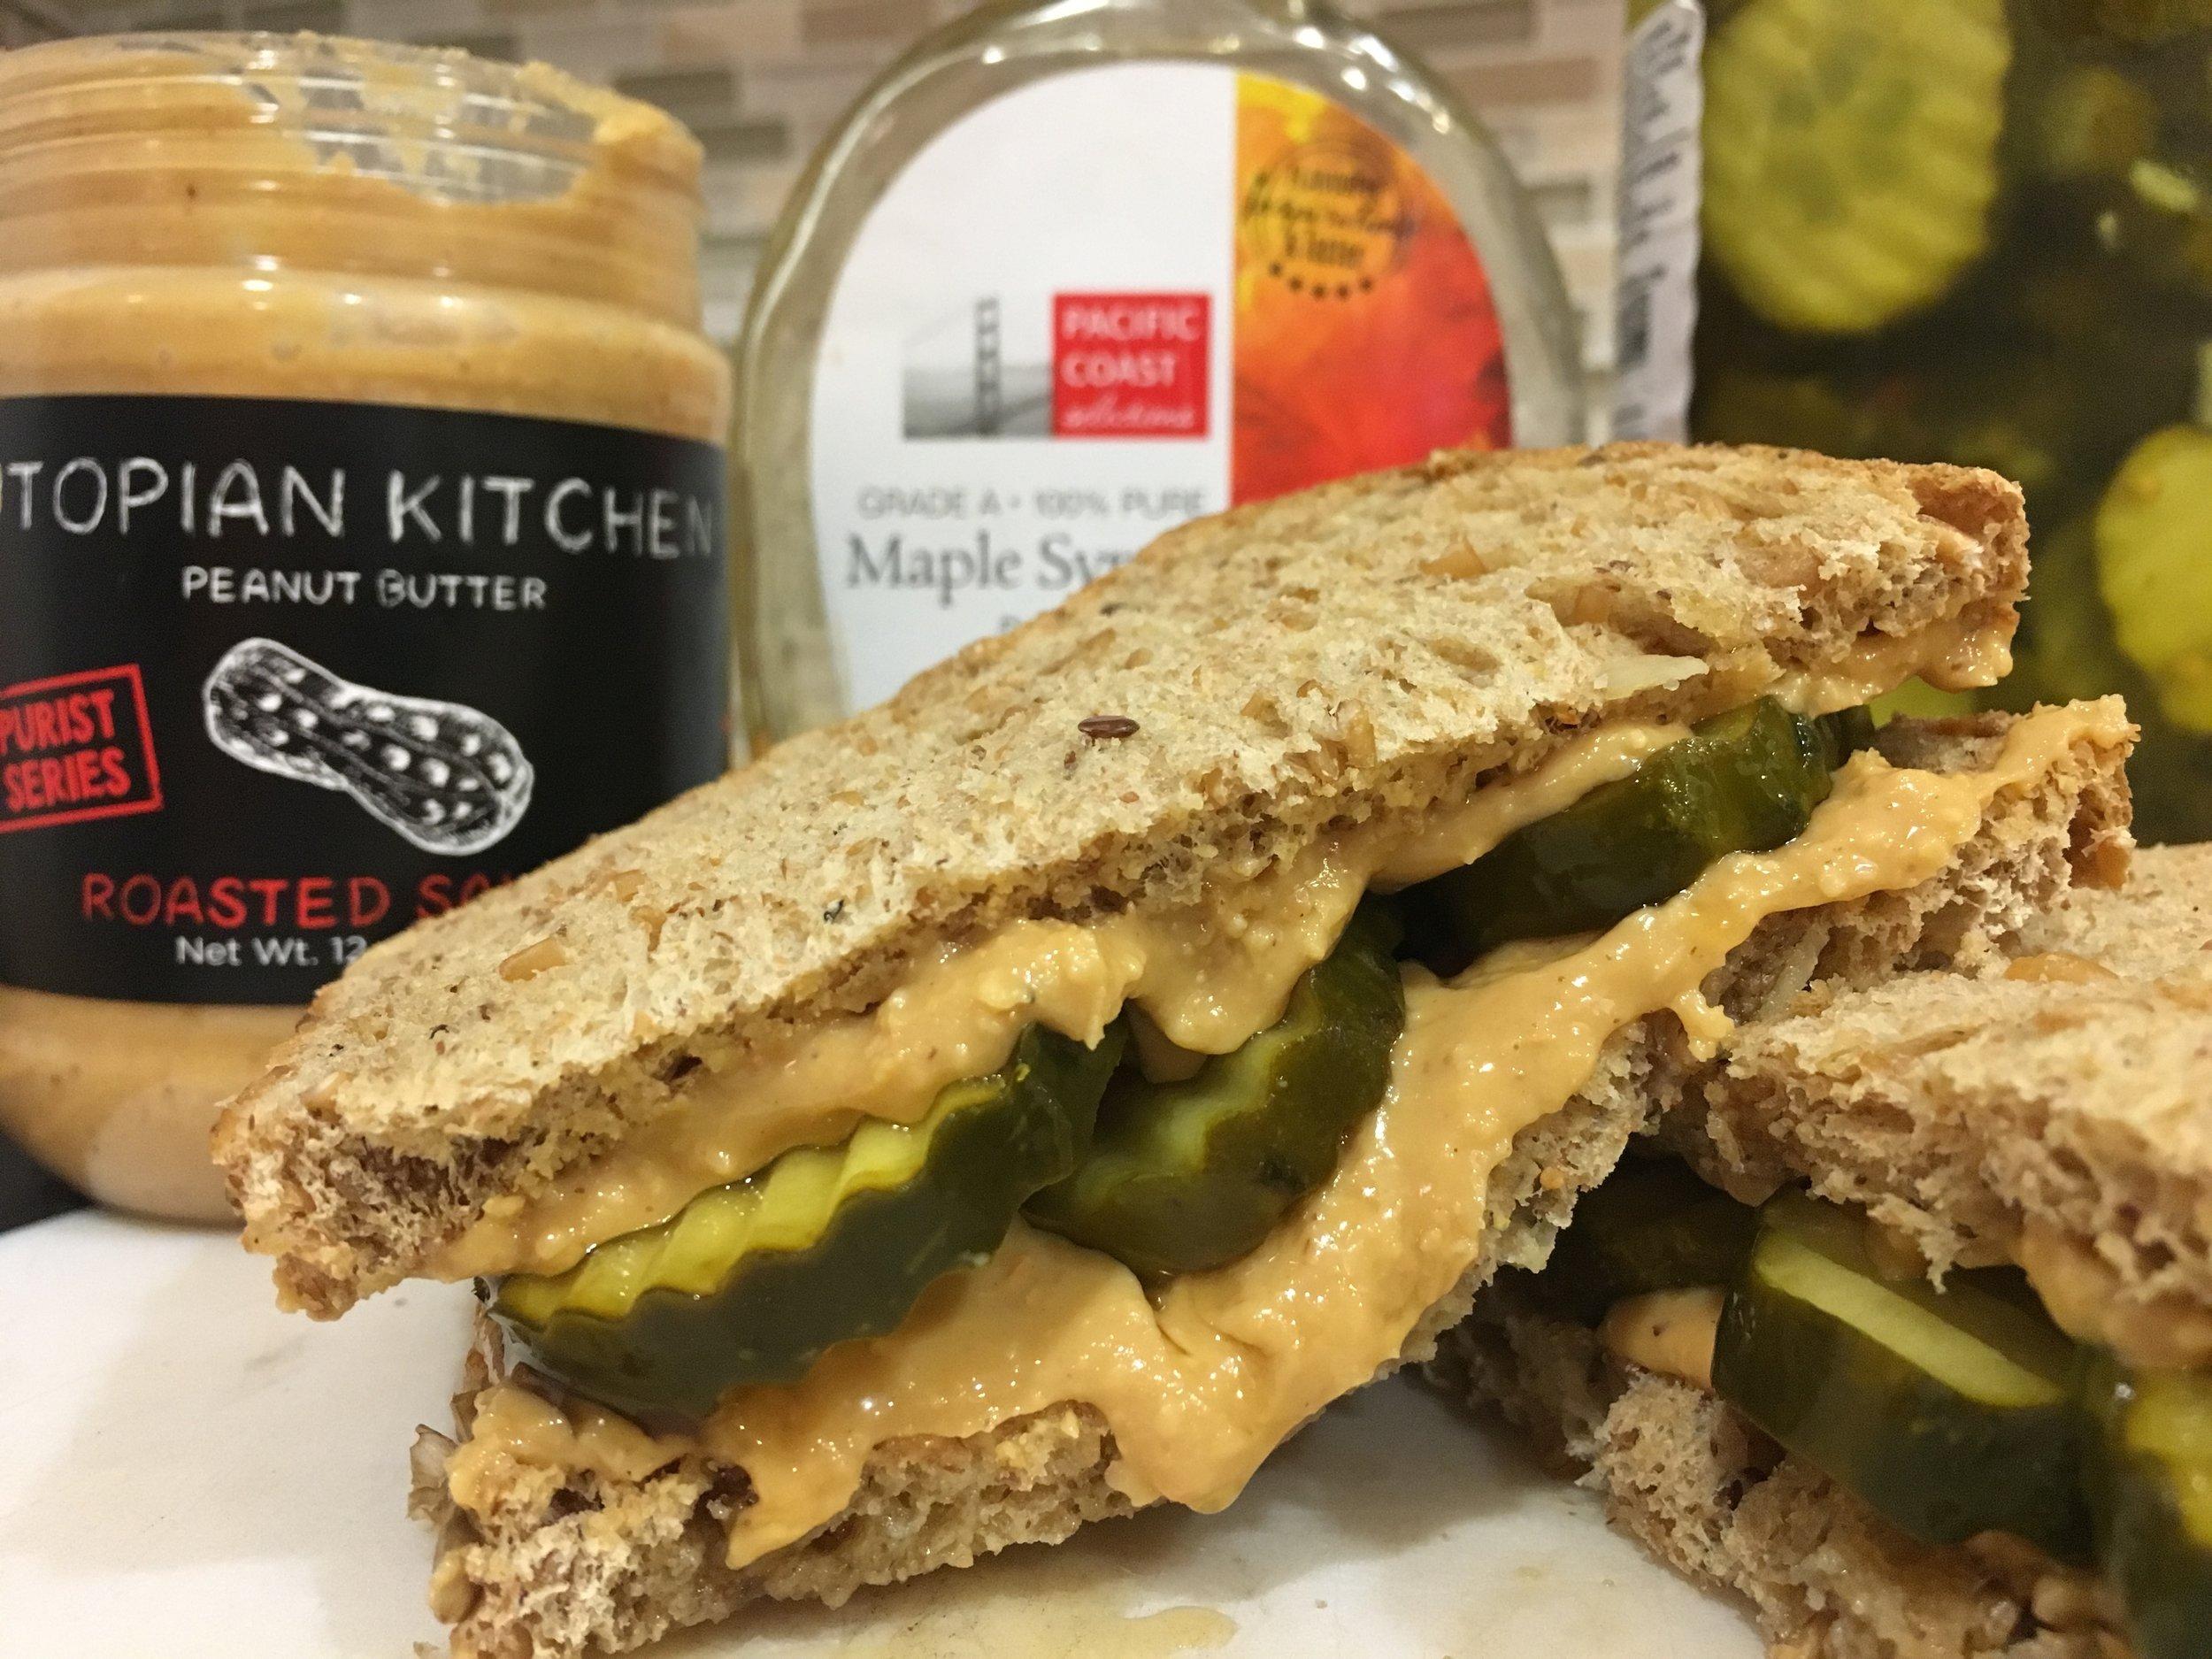 Peanut Butter & Pickle Sandwich - Click for recipe